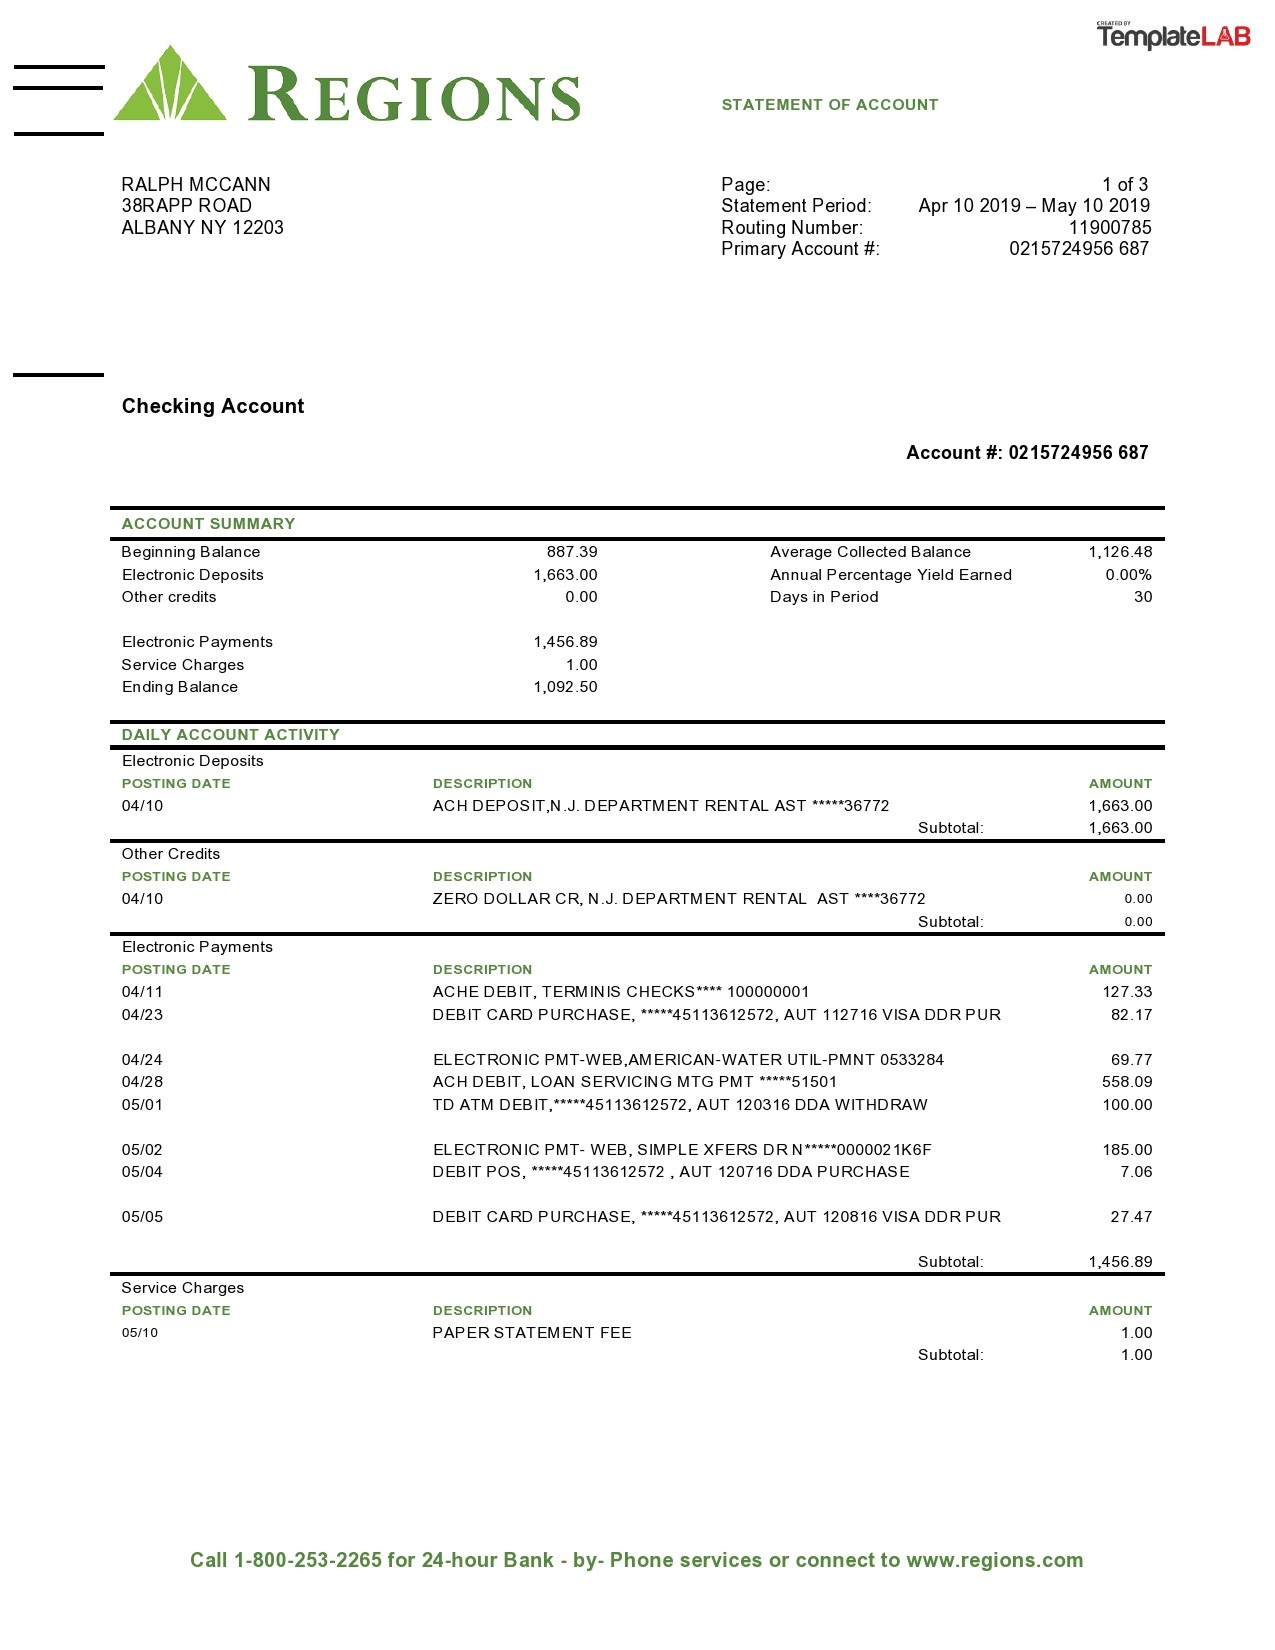 Free Regions Bank Statement - TemplateLab.com